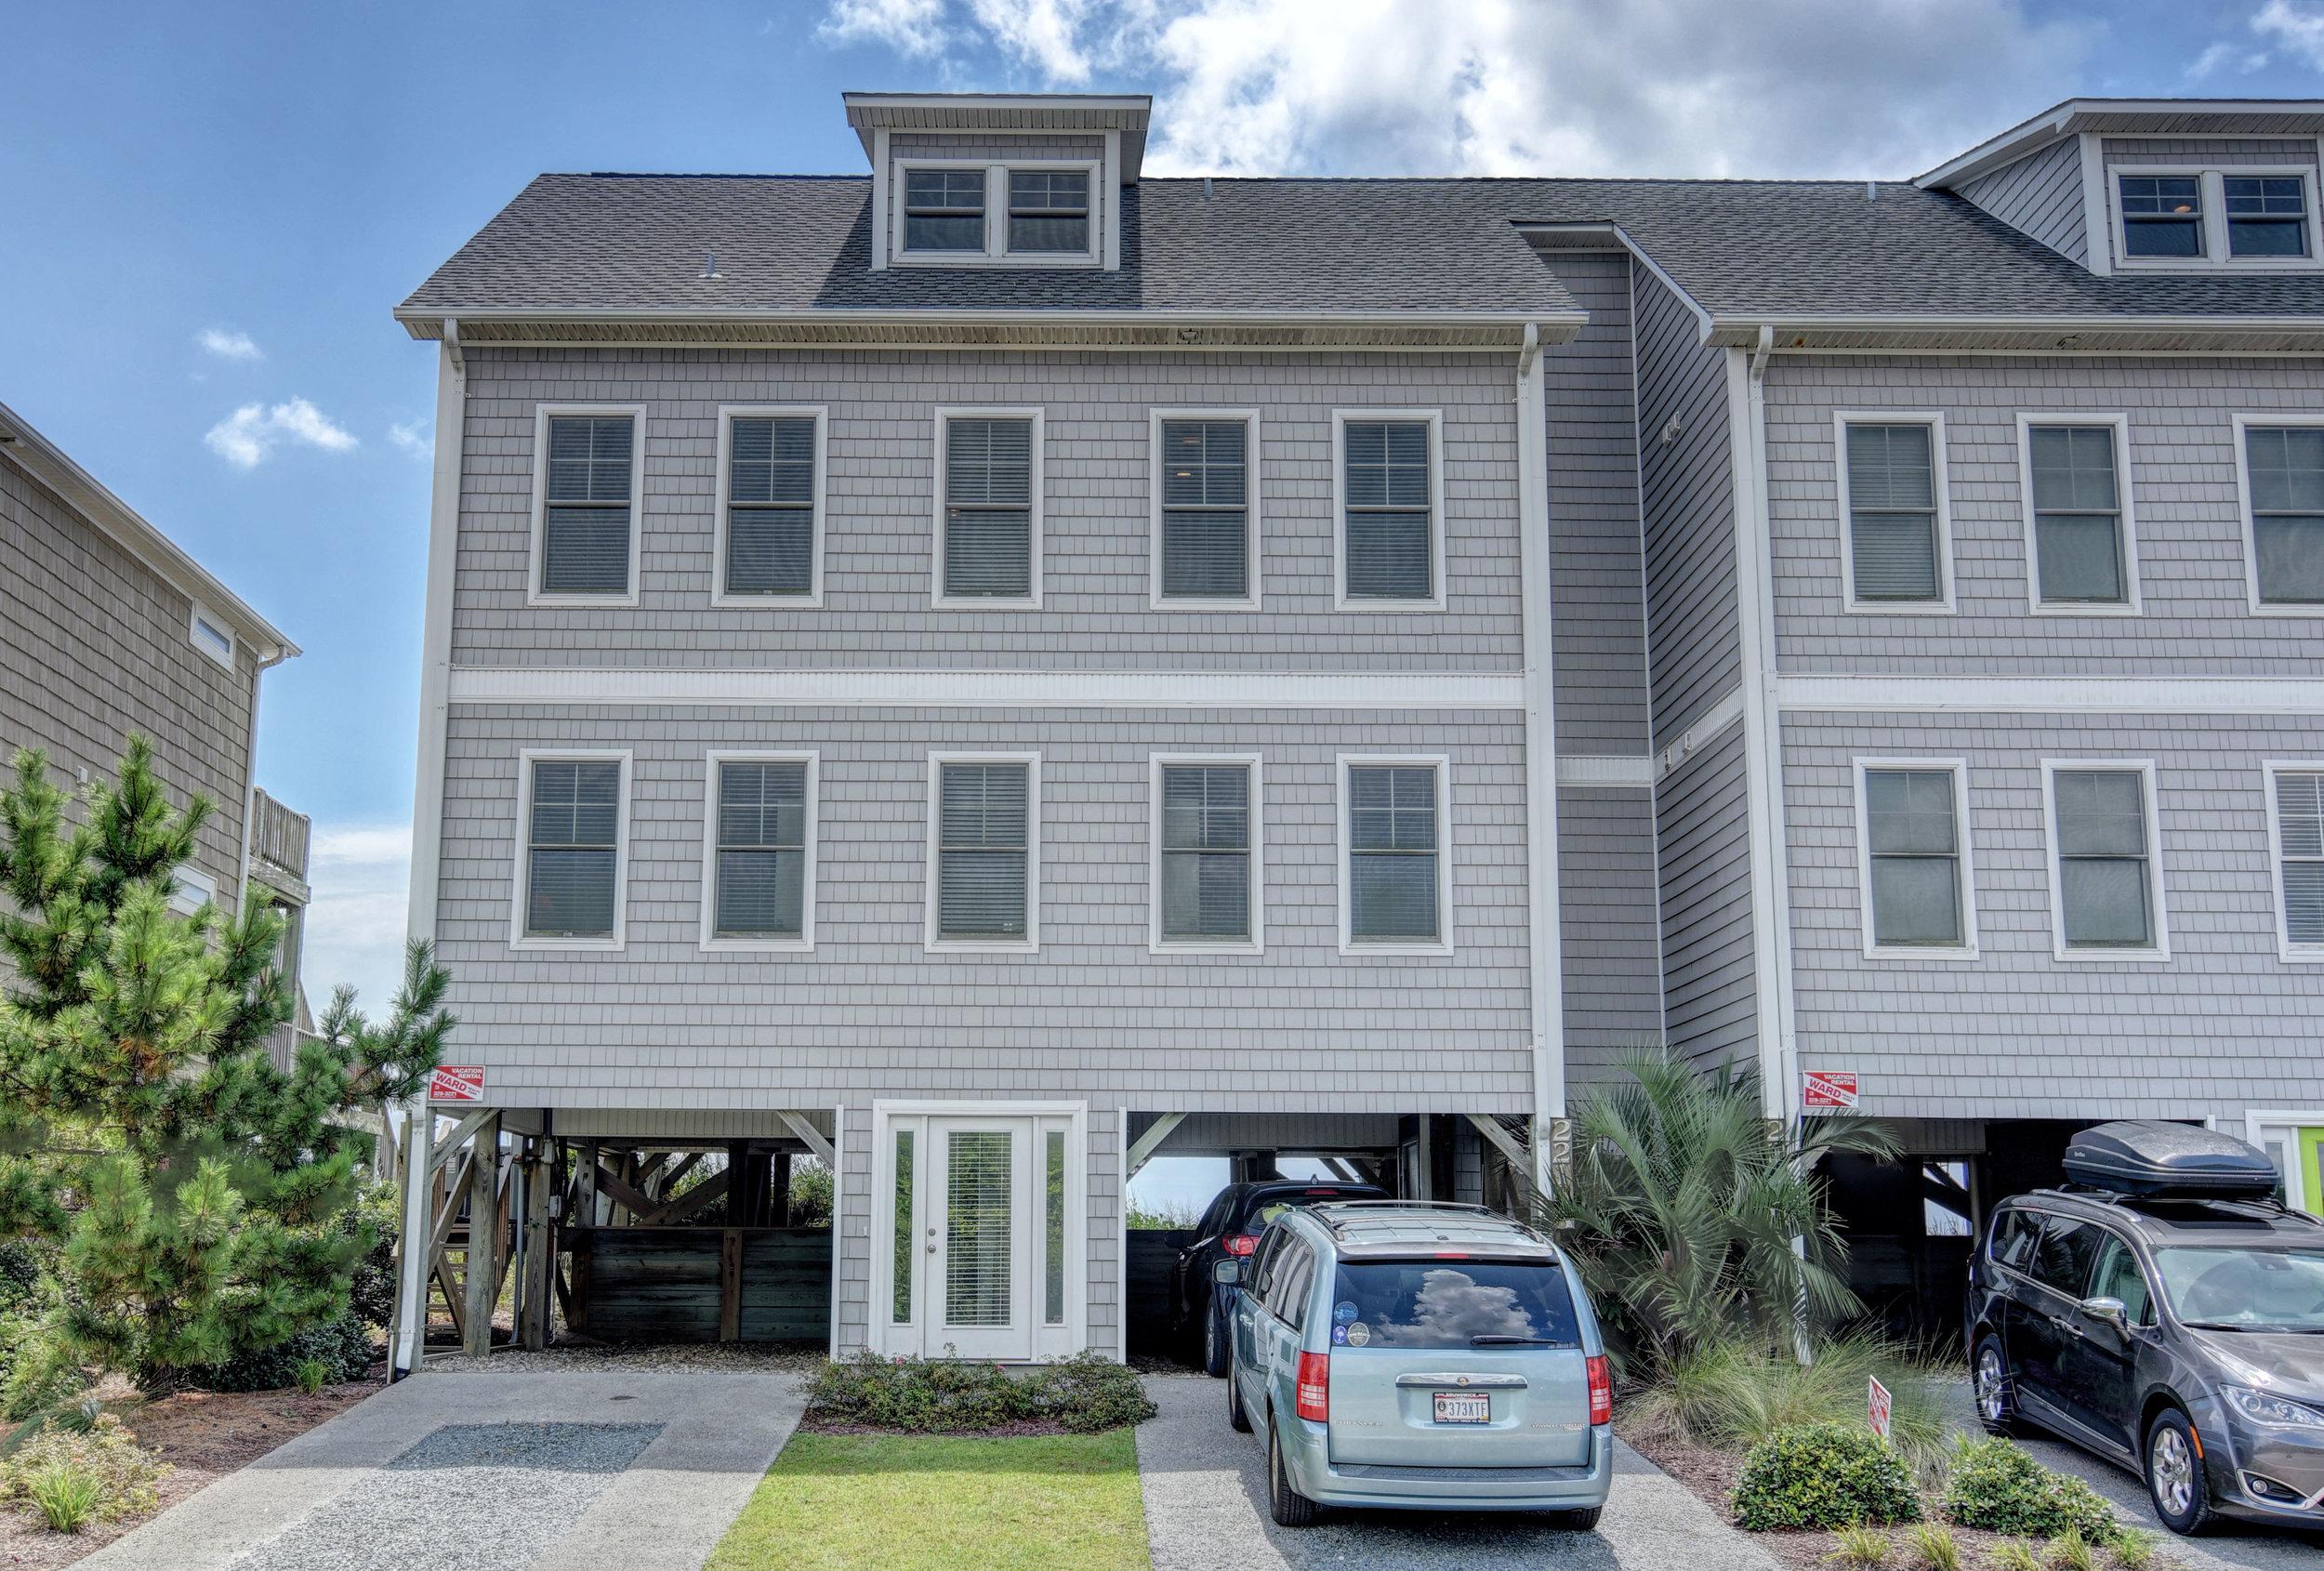 2216 S Shore Dr Surf City NC-print-001-1-DSC 6586 7 8-4038x2729-300dpi.jpg